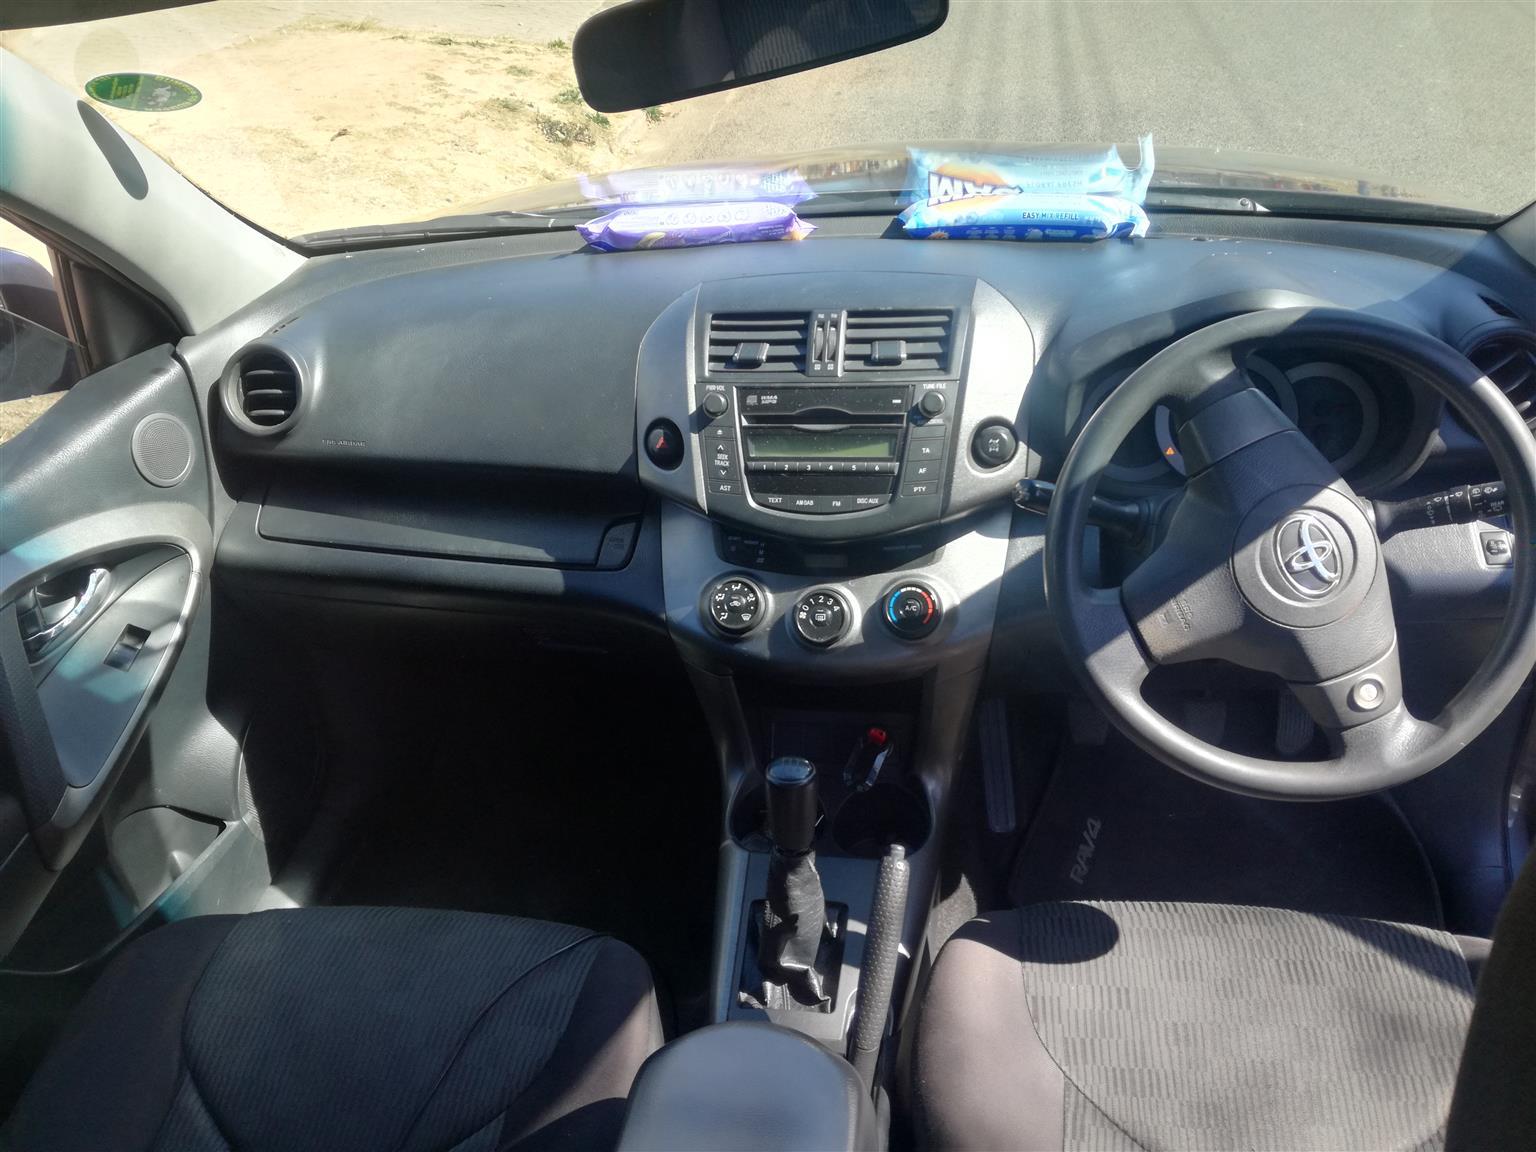 2011 Toyota Rav4 RAV4 200 5 door 4x4